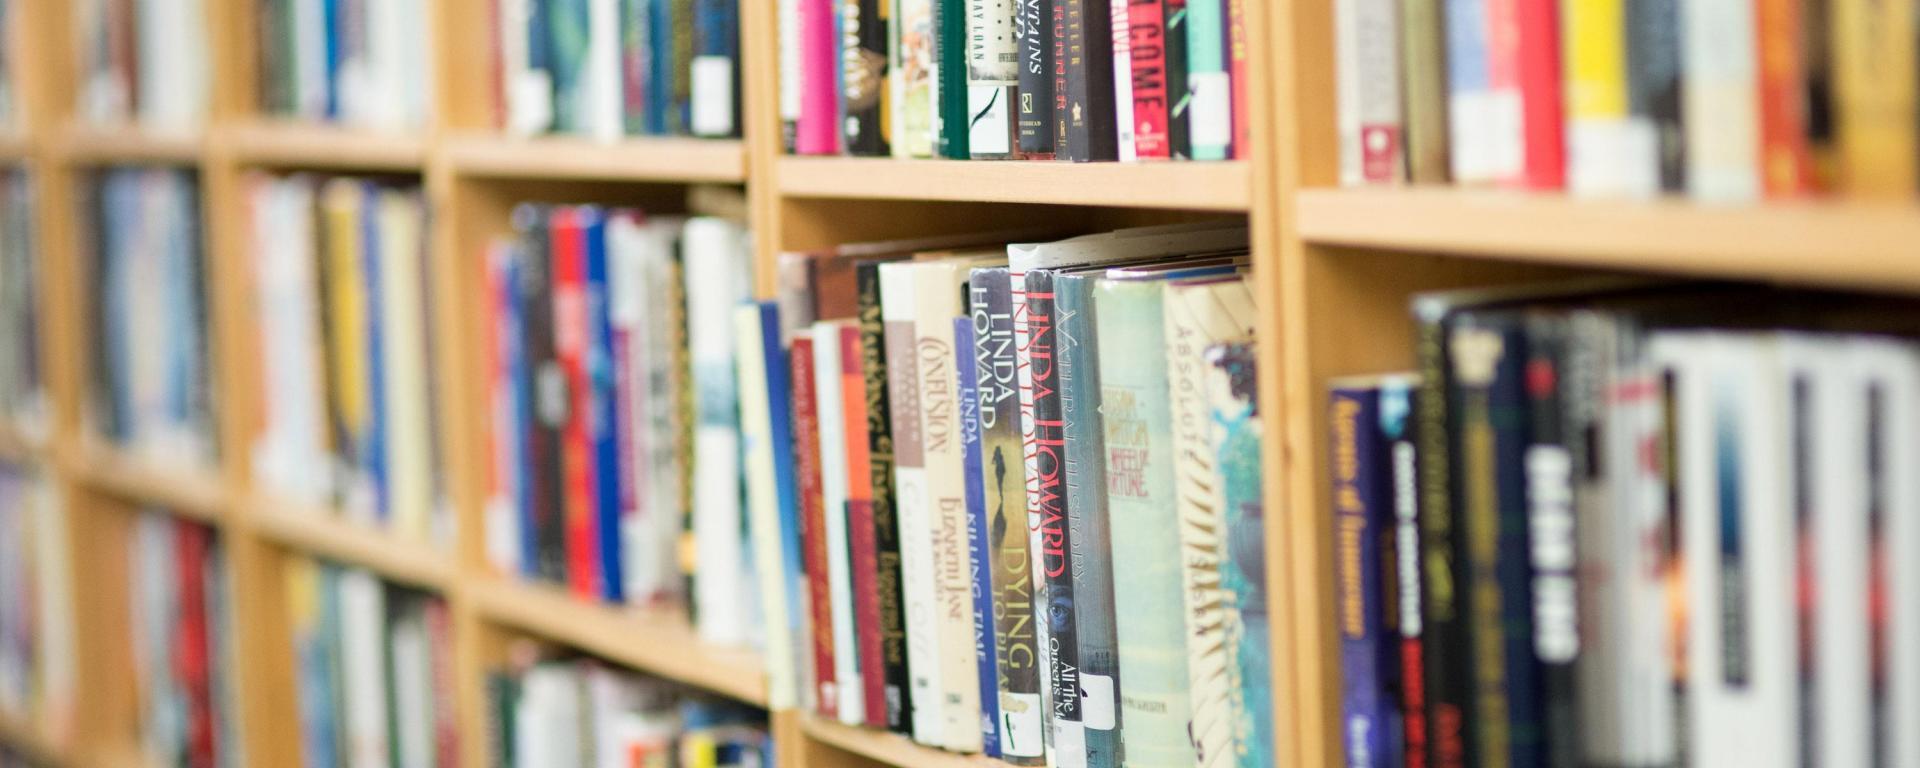 image of books an the sale shelf